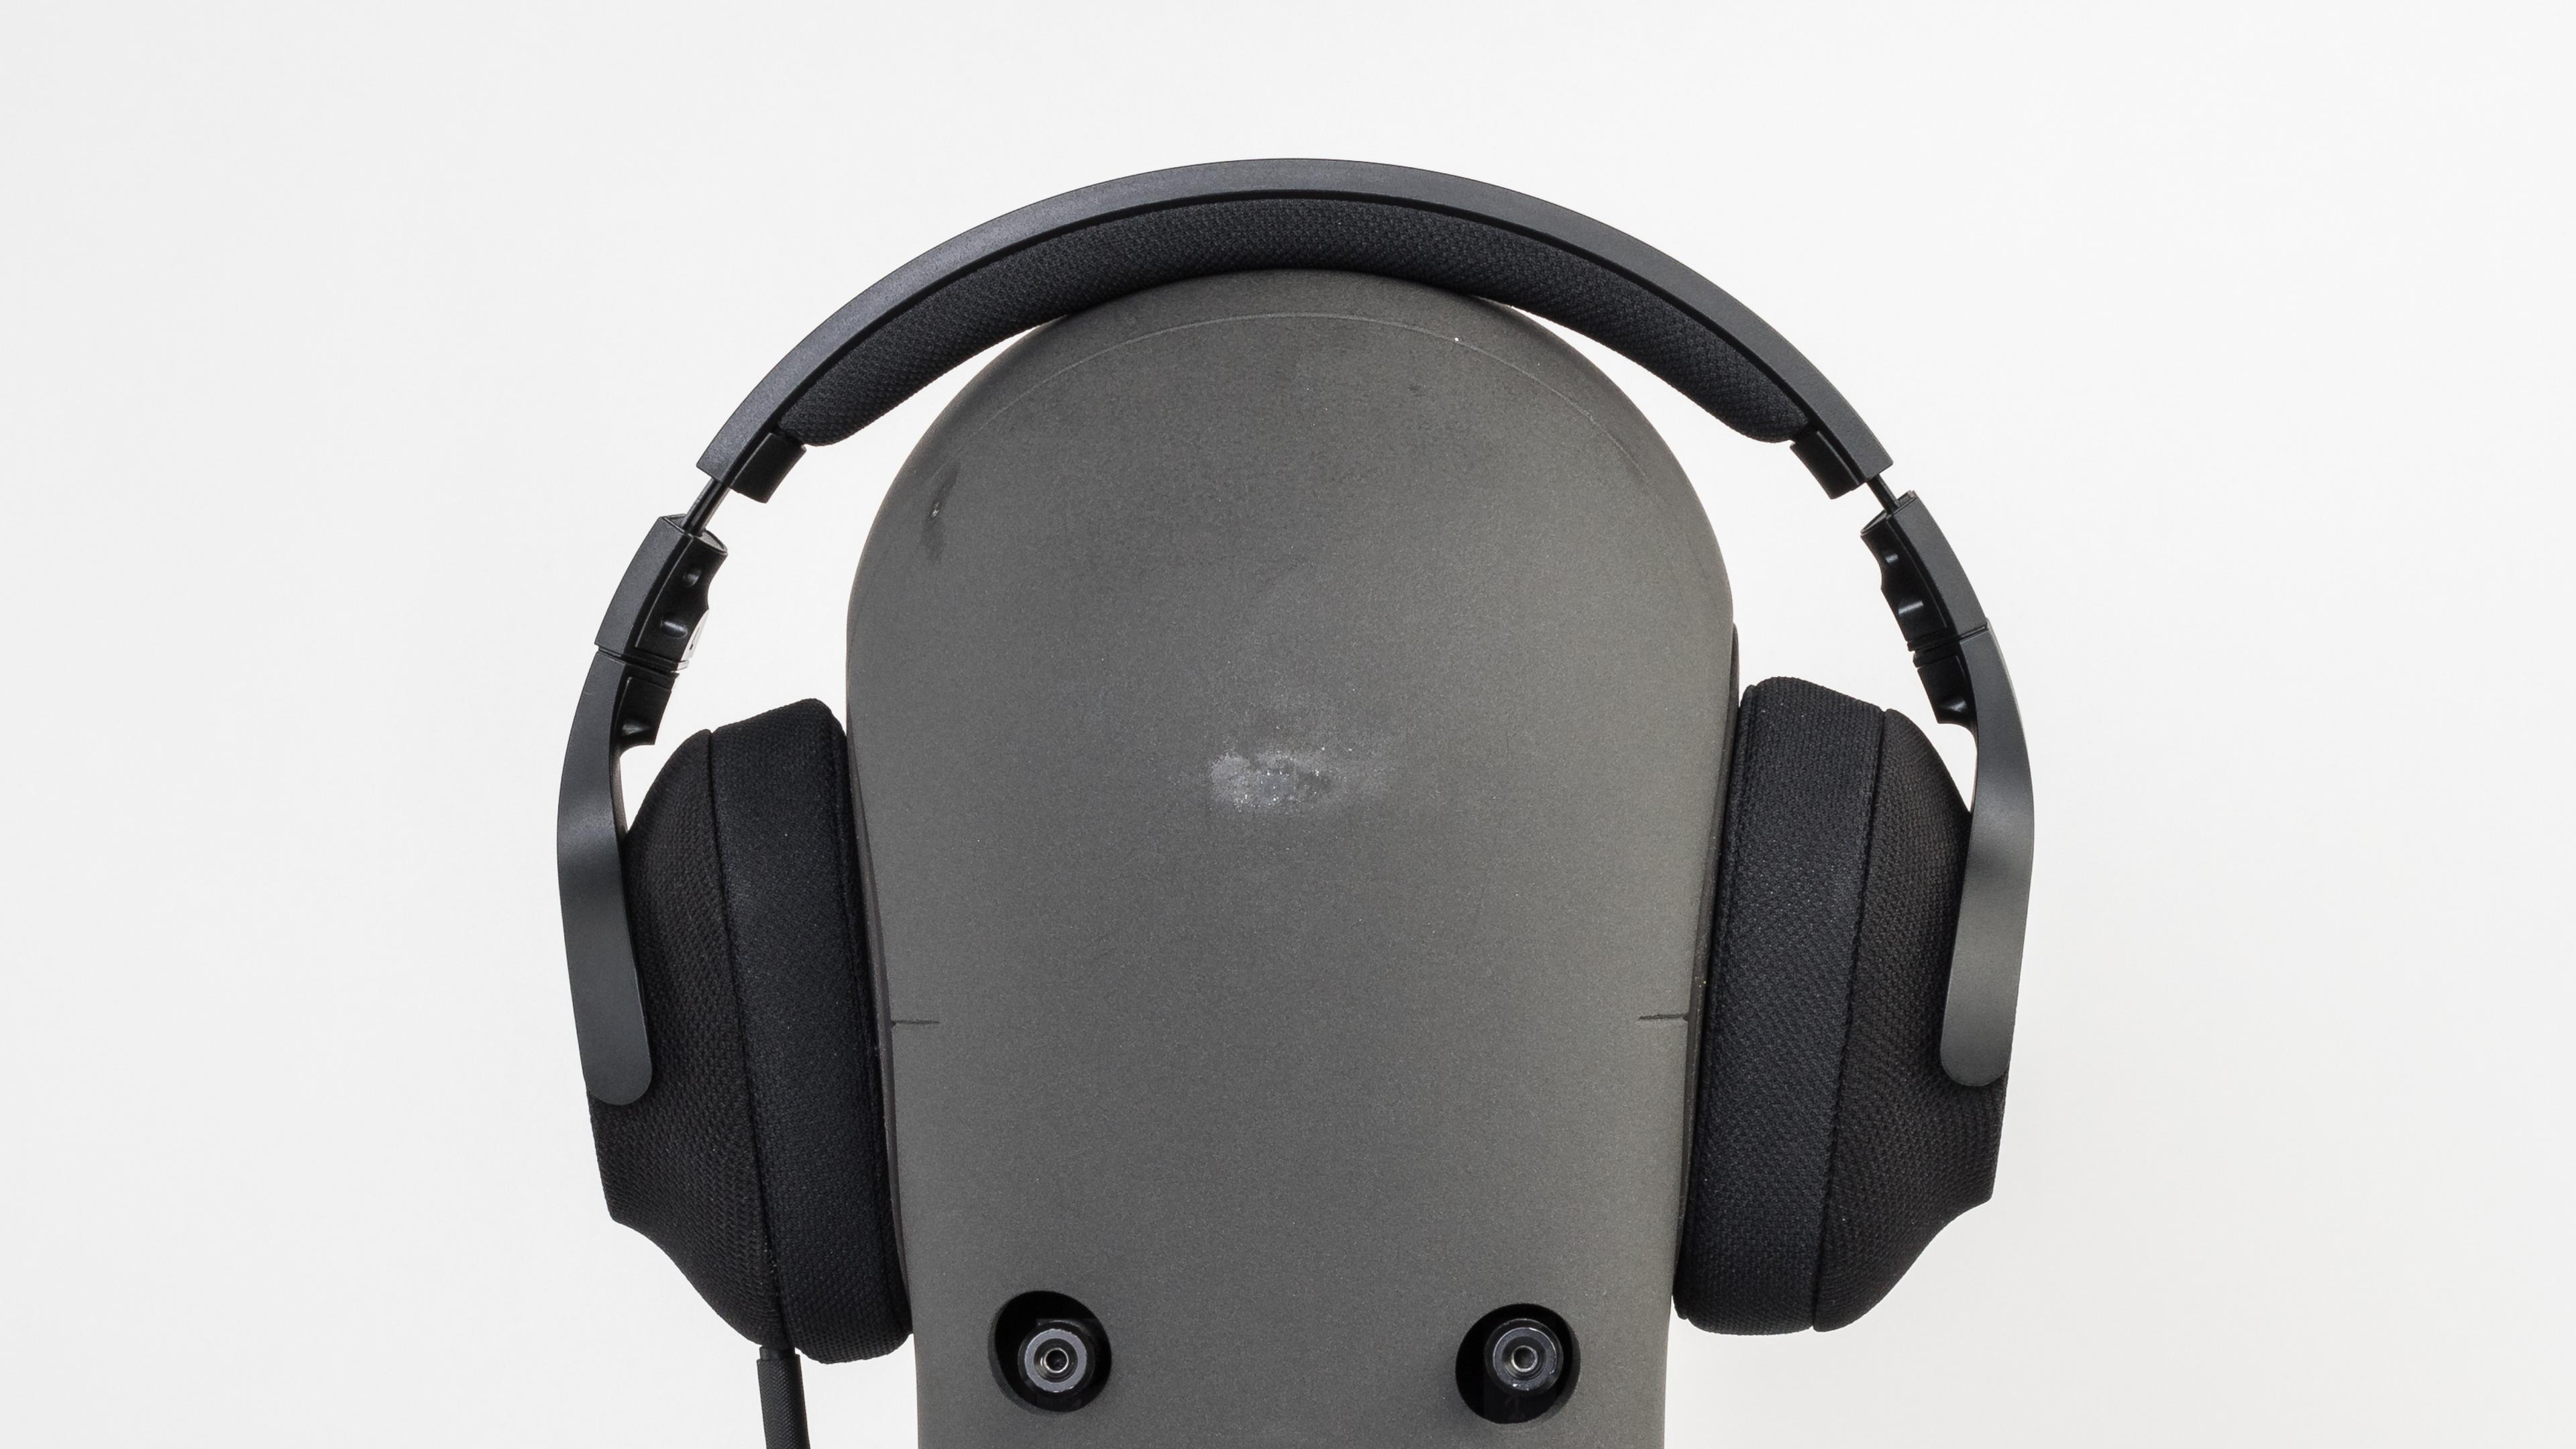 Logitech G430 Headset Wiring Diagram